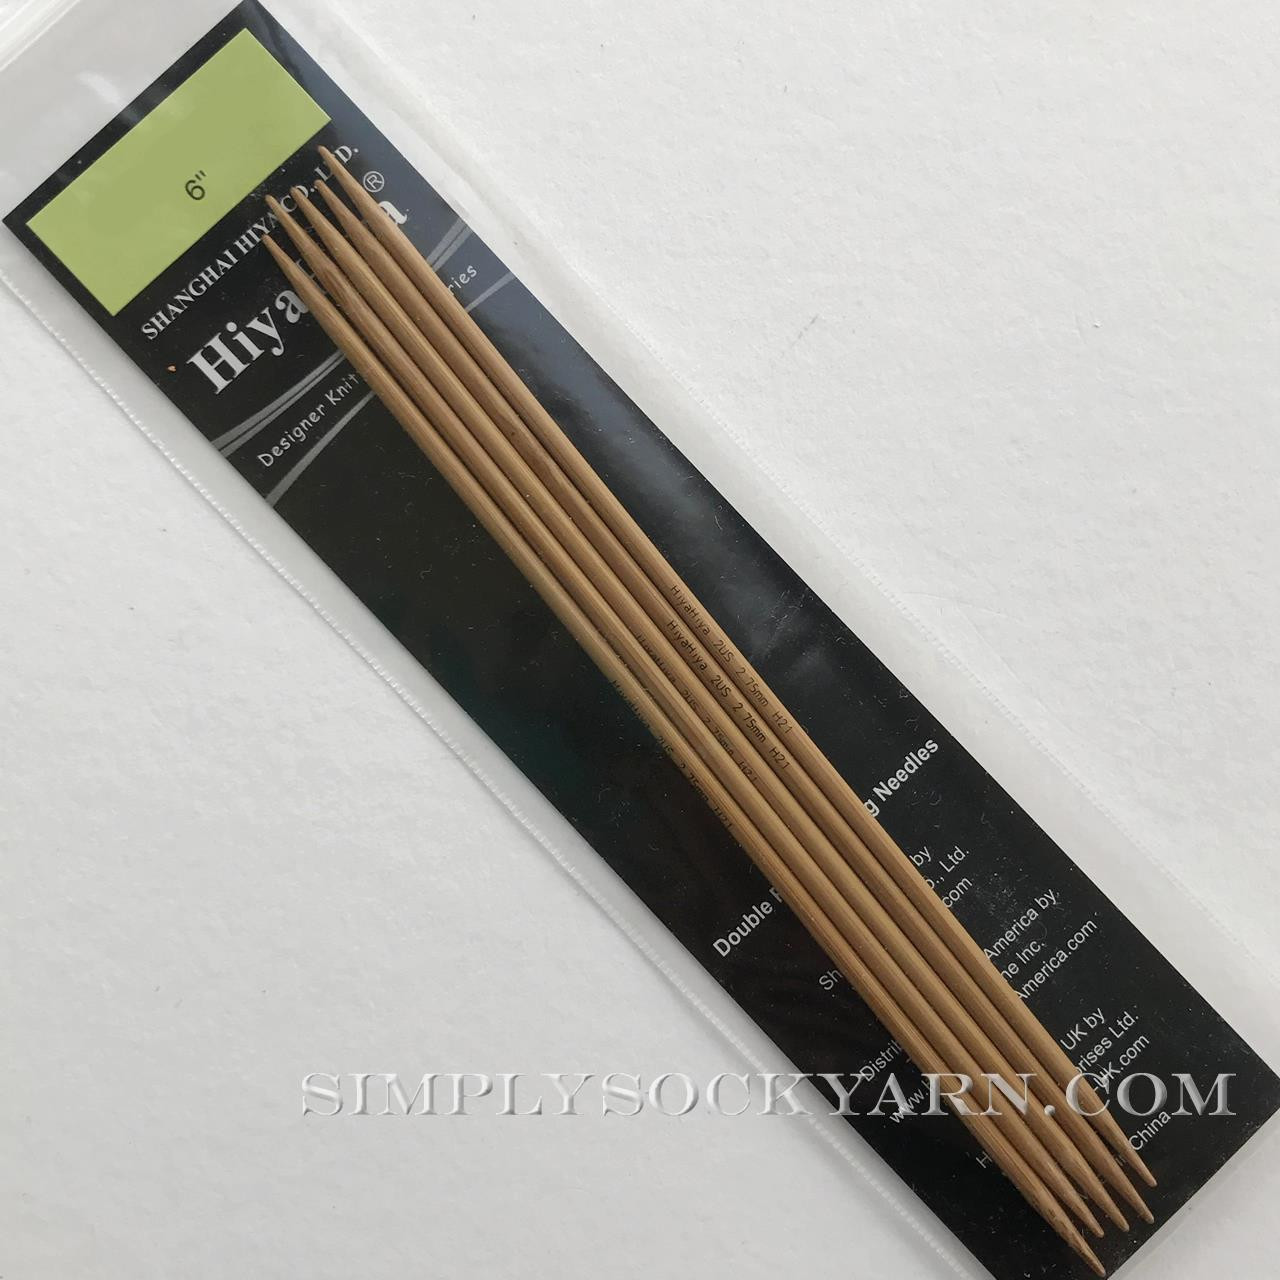 "Hiya 6"" DP Bamboo US 5 -"